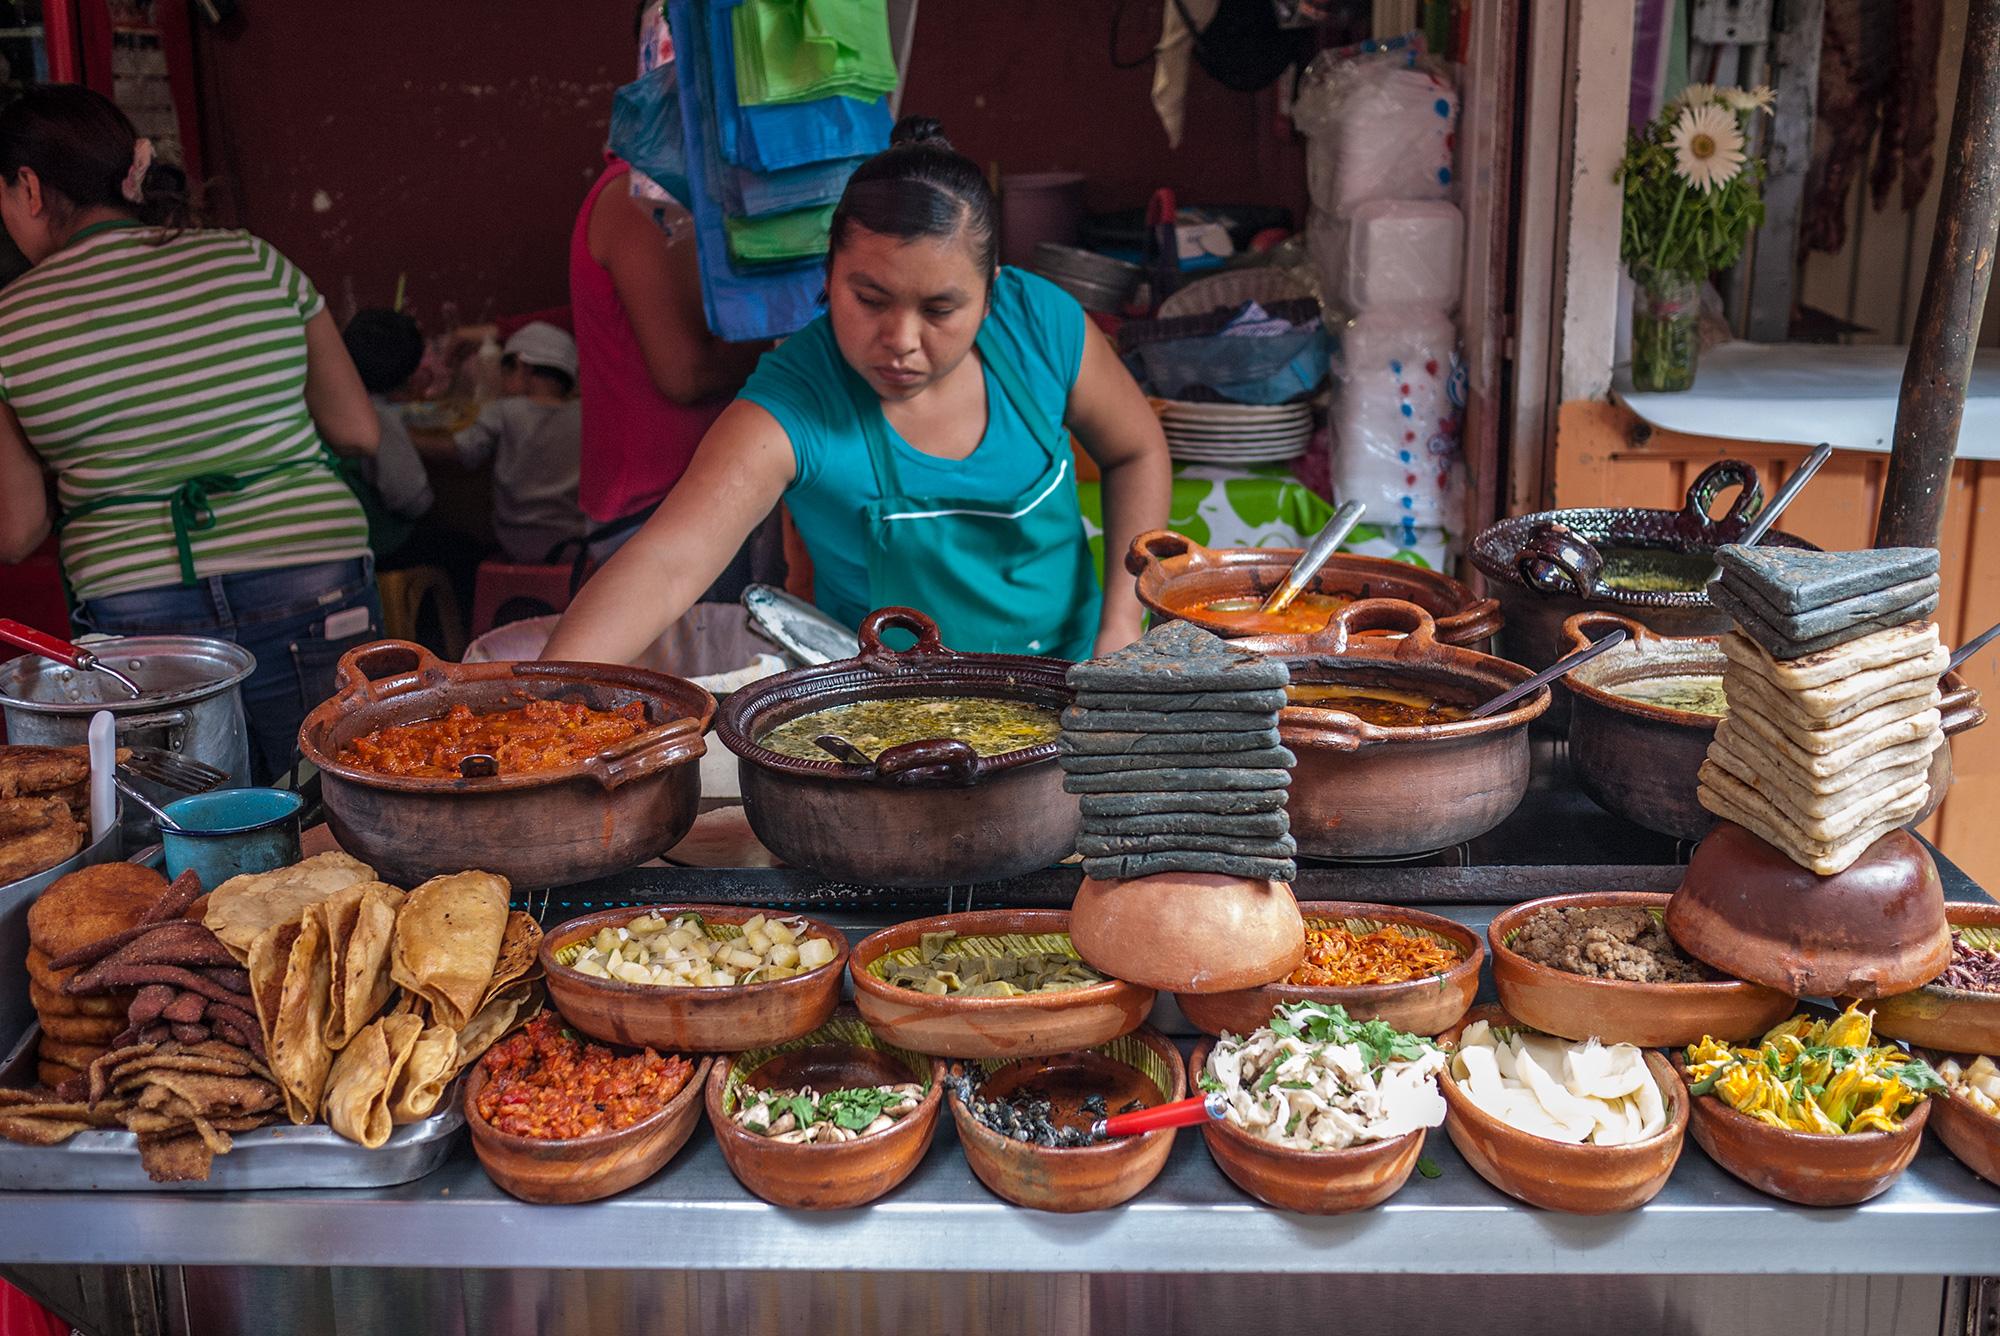 itacates-toppings-tepoztlan-market-mexico.jpg